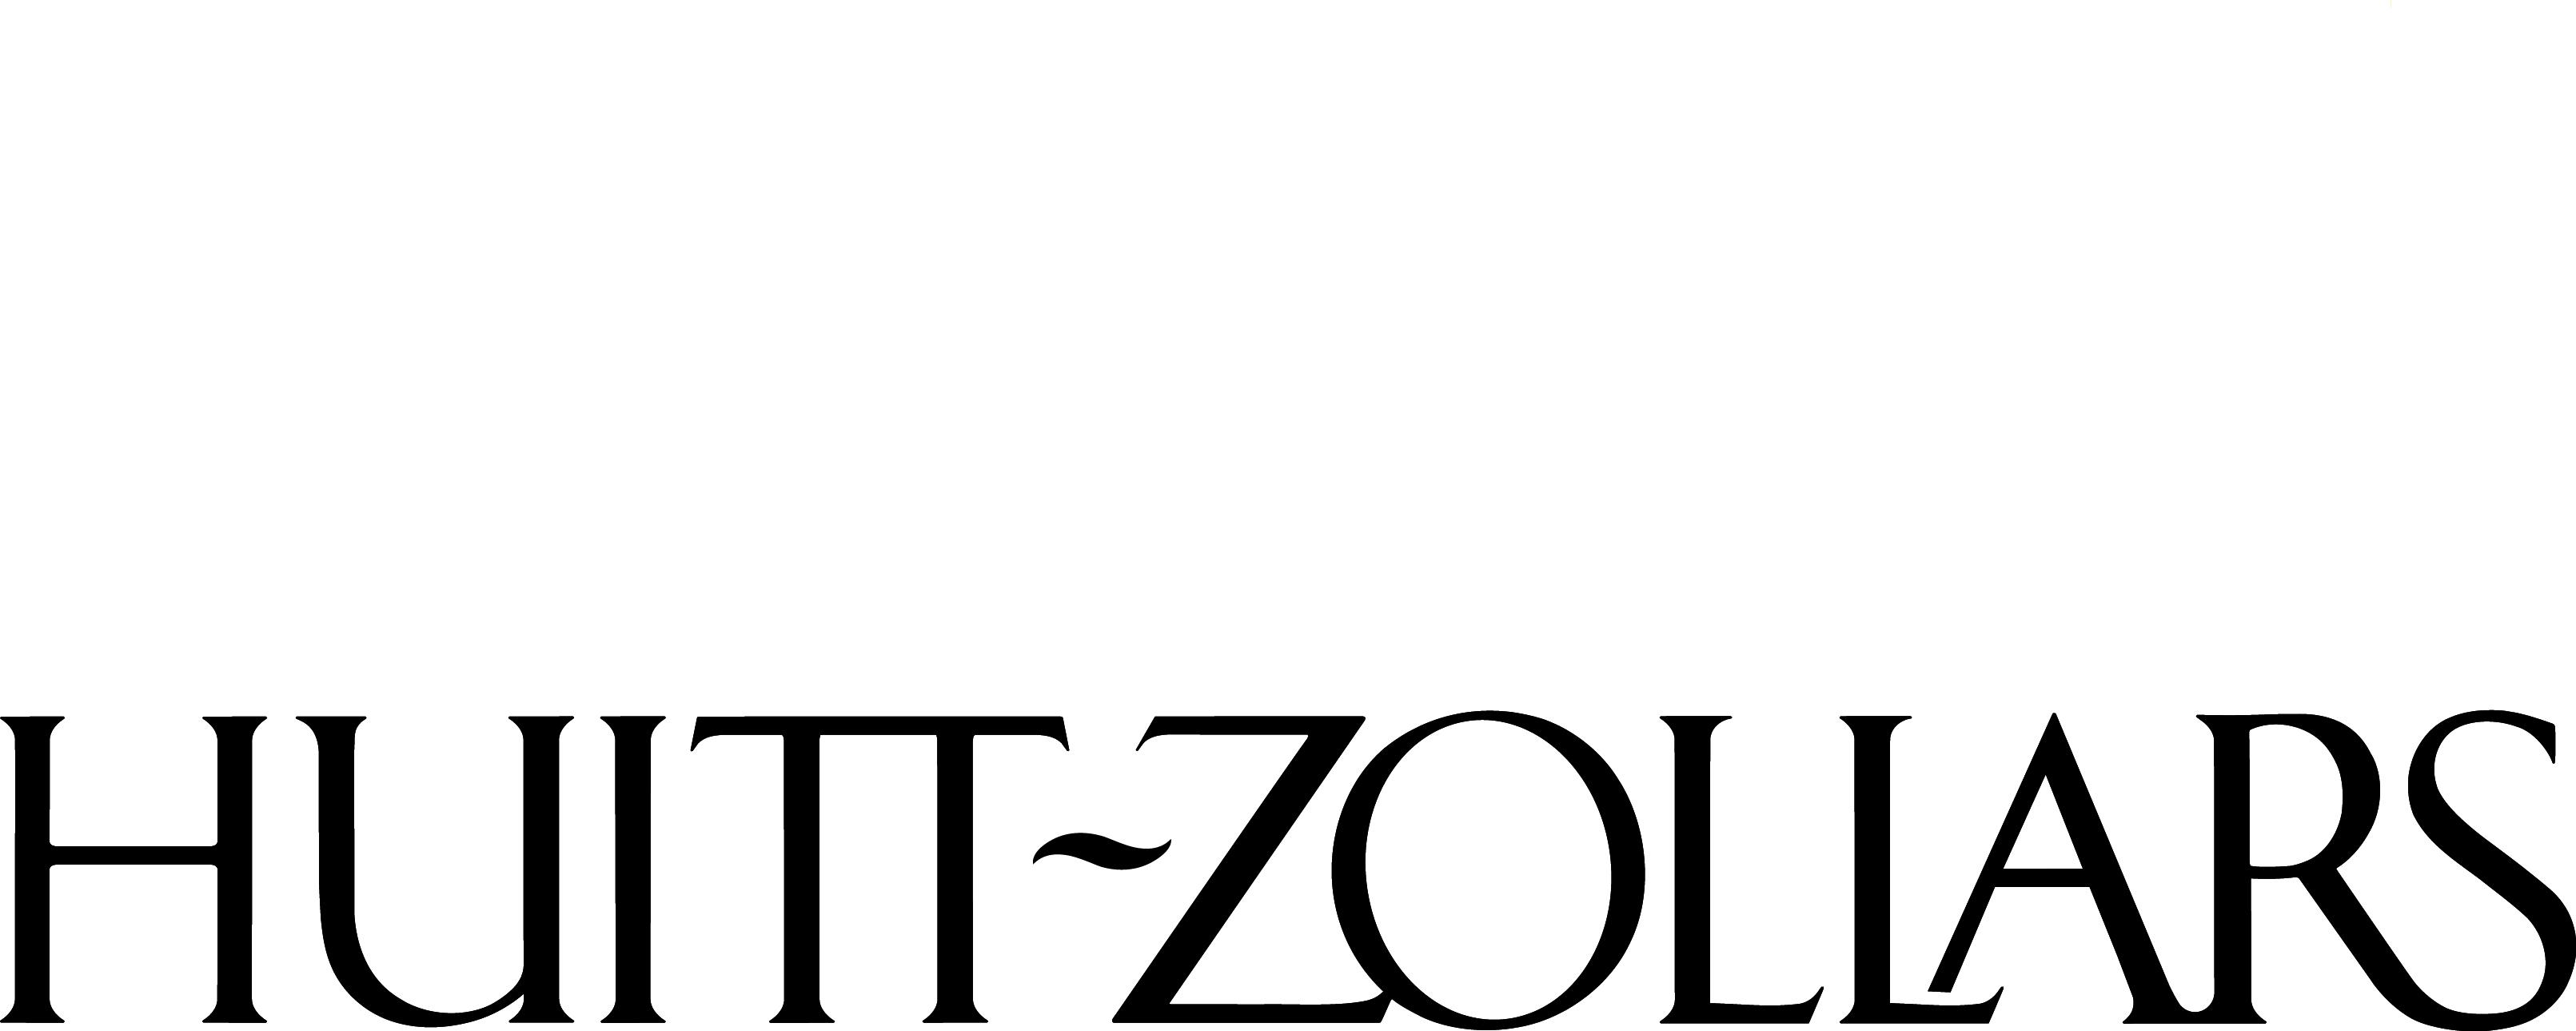 2017 WiA Conference - Huitt-Zollars logo